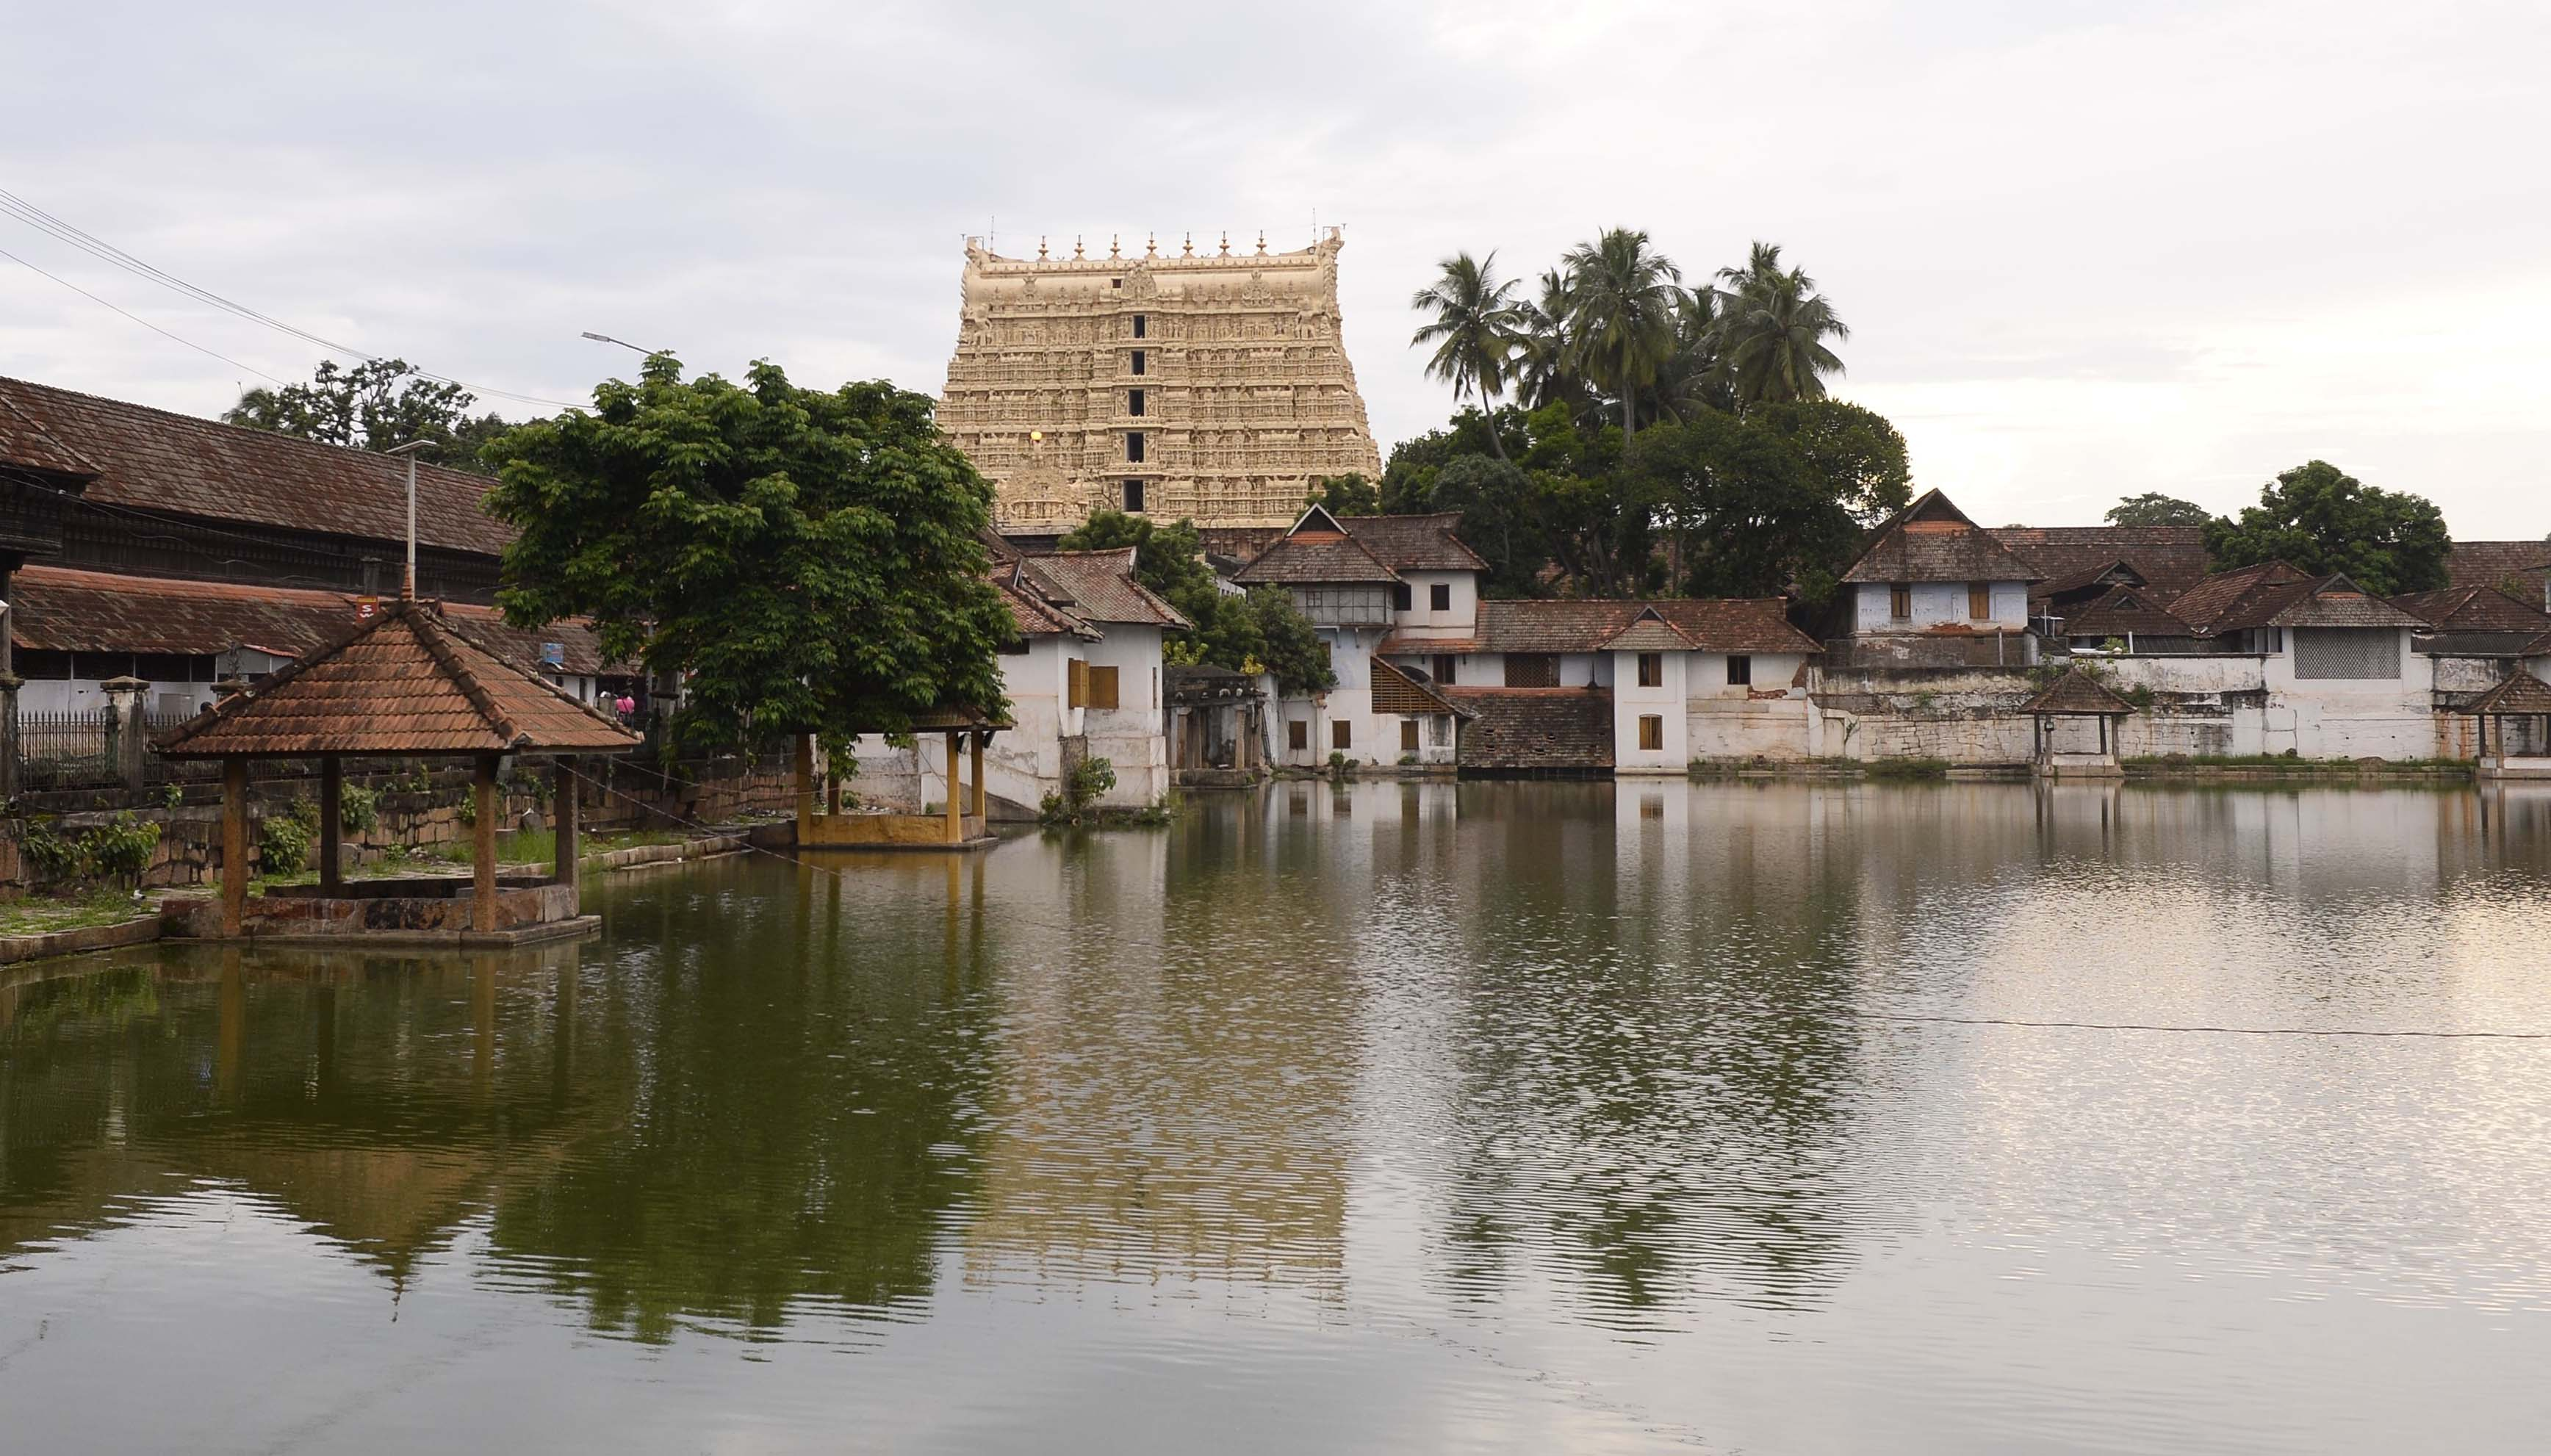 In limbo a kerala temple and its chamber of secrets - Chambr kochi ...